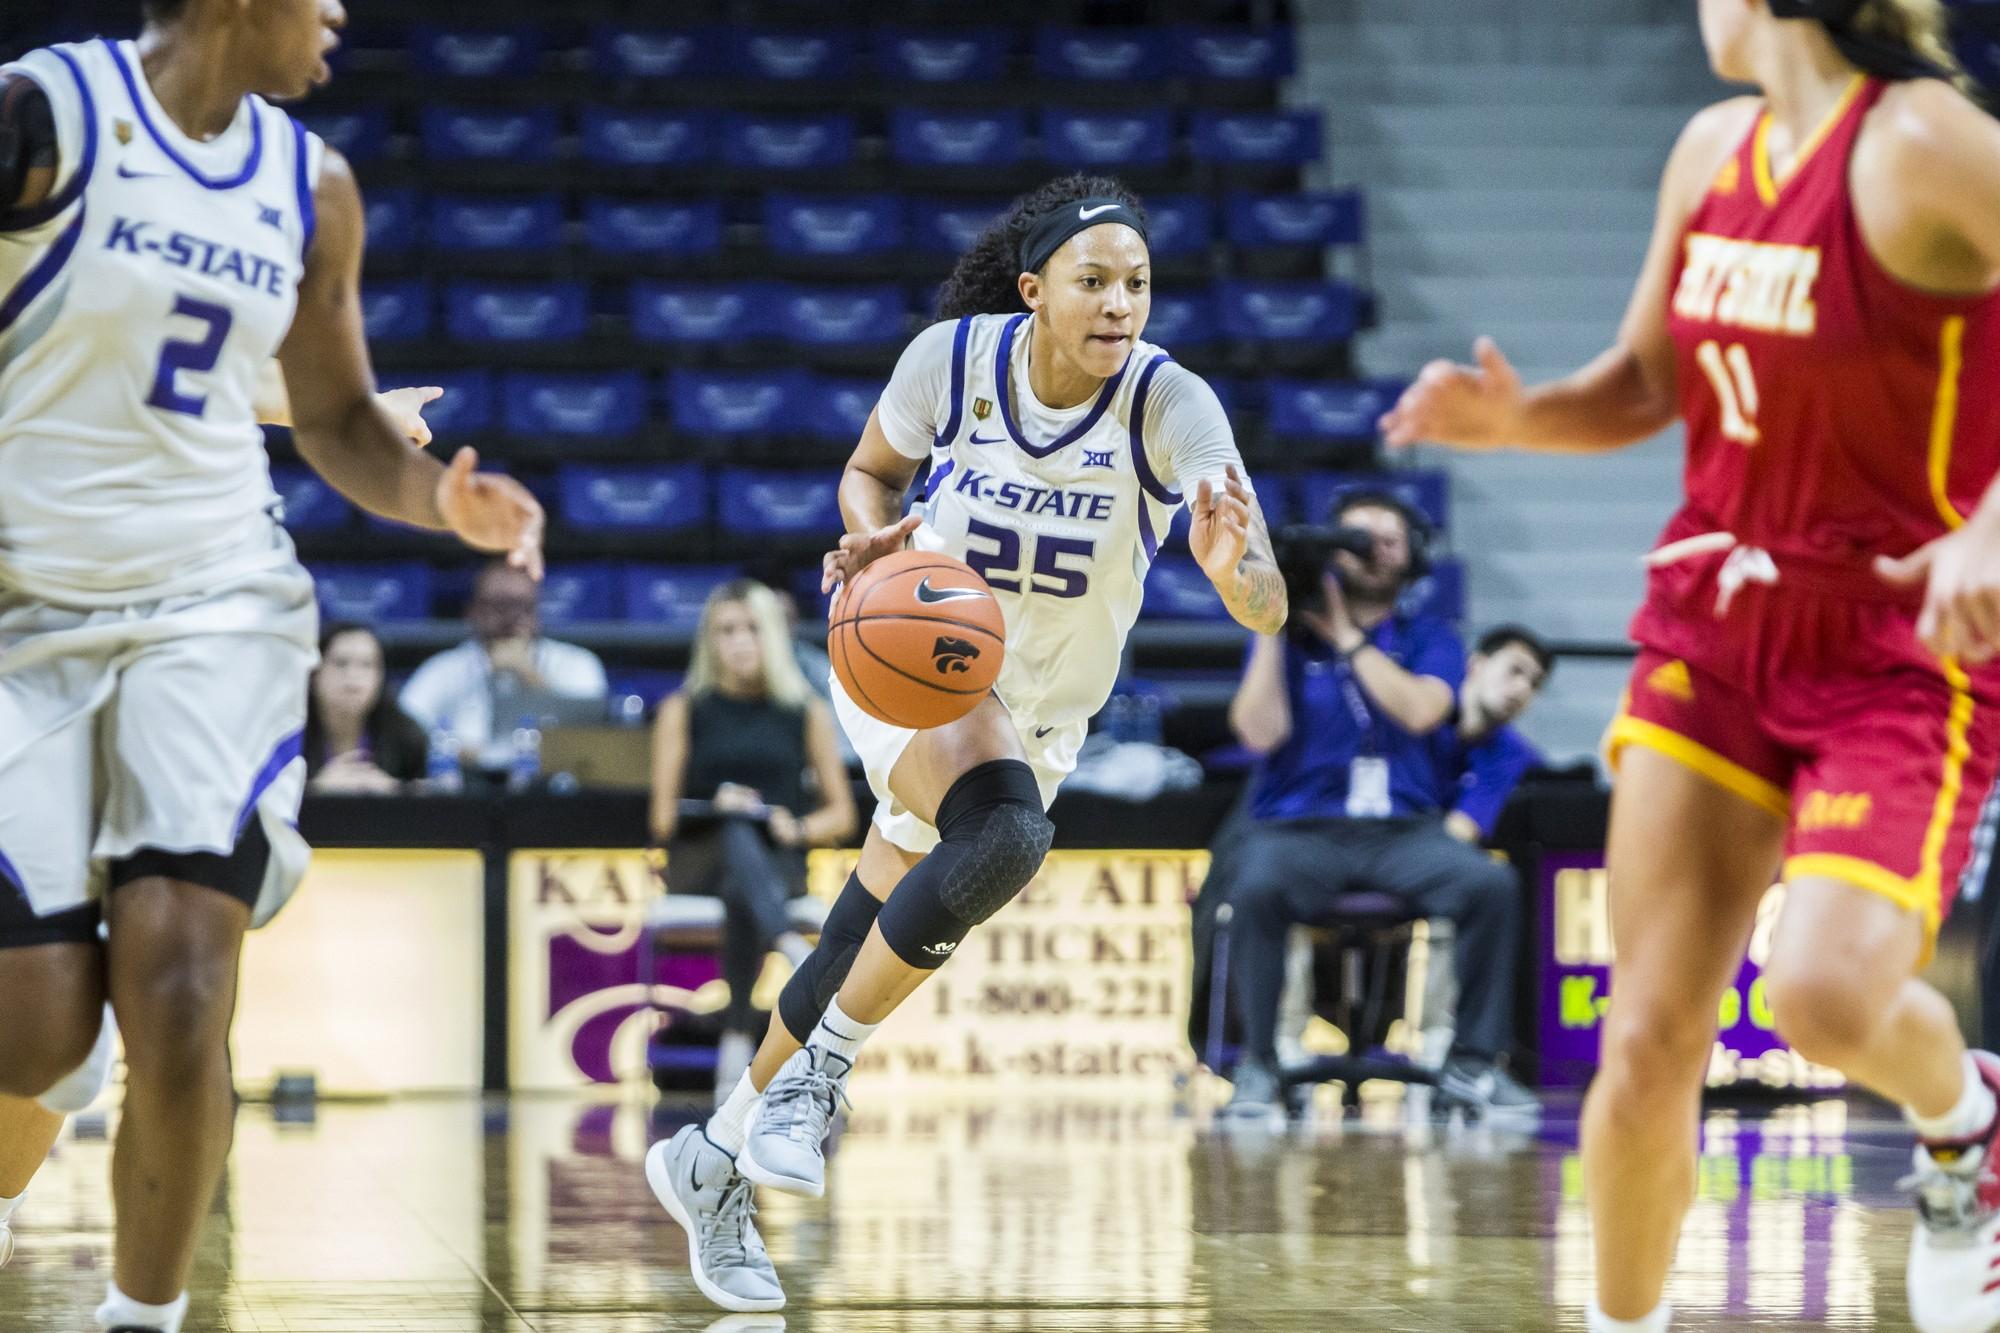 Women's Basketball Dominates No. 11 Texas 87-69 At Home